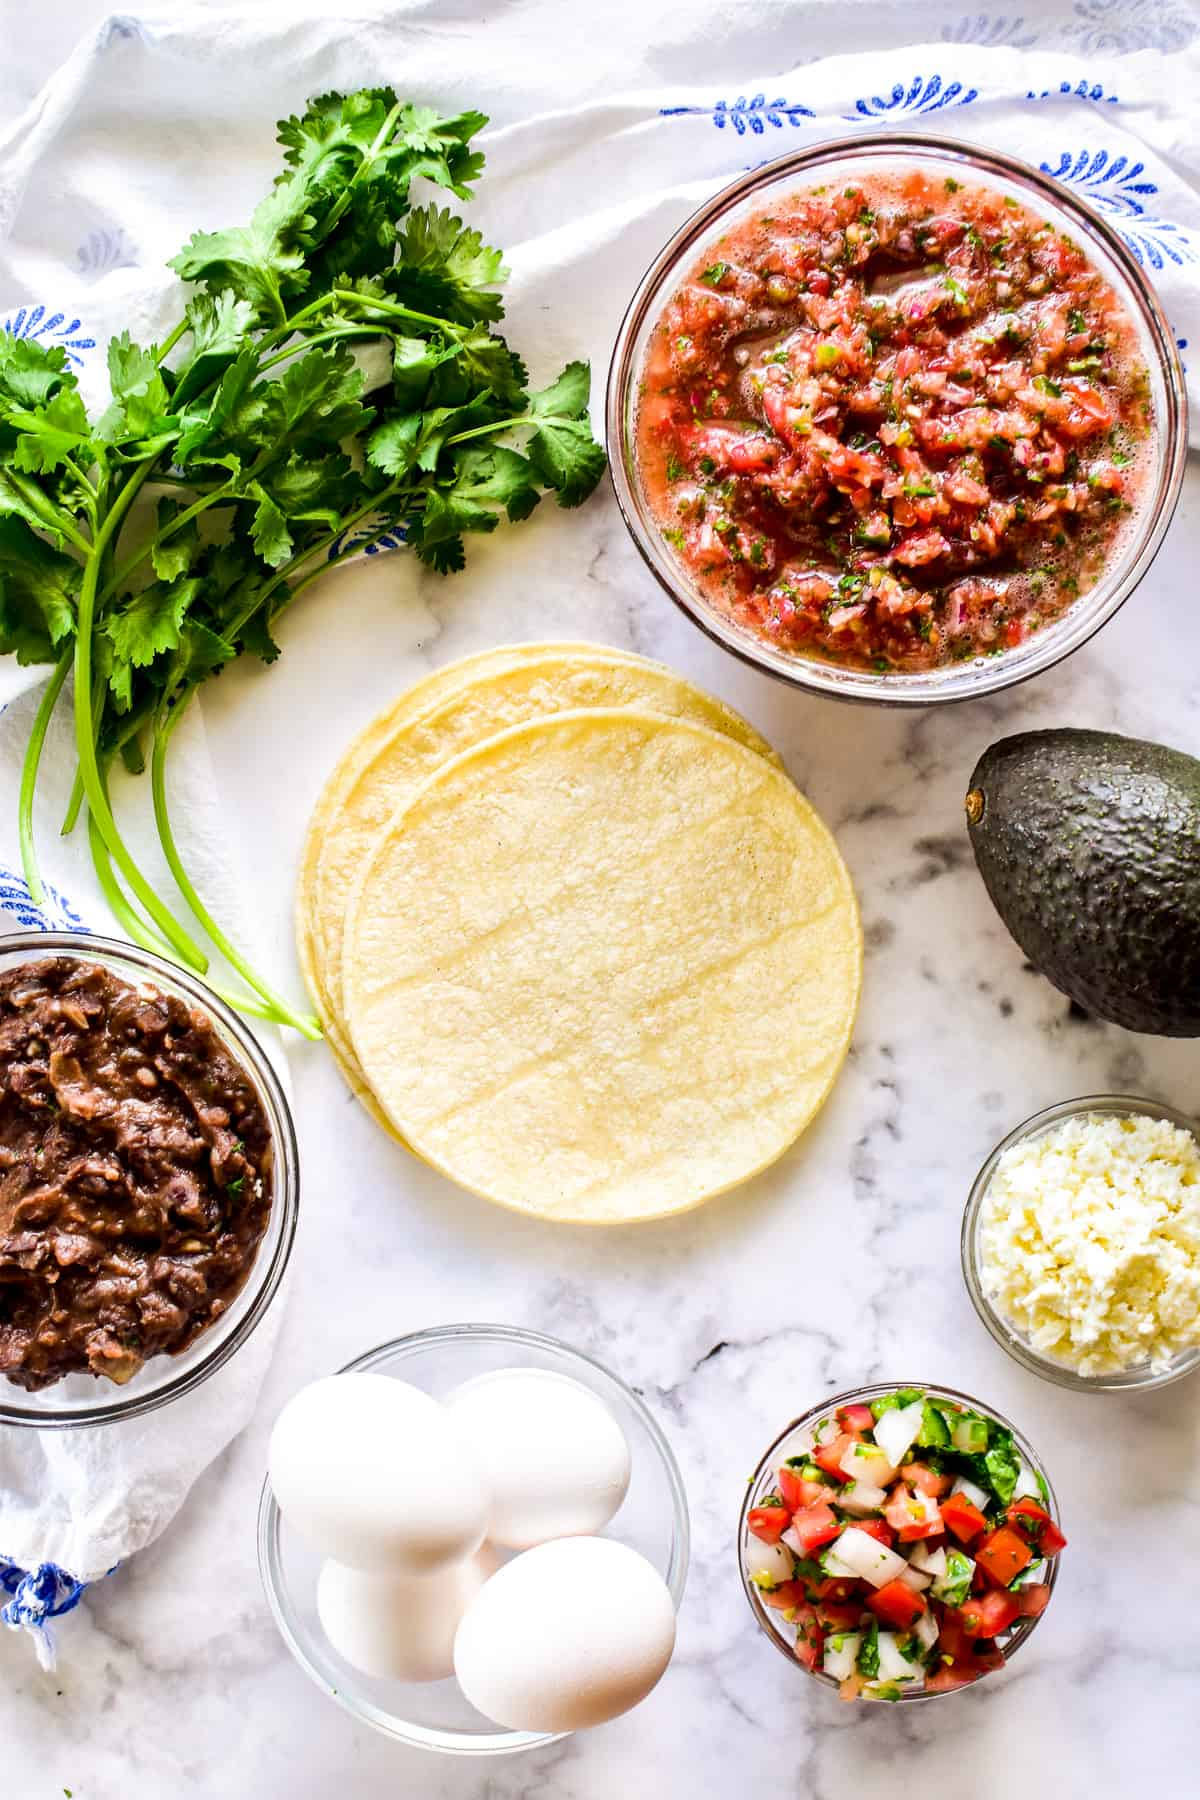 Huevos Rancheros ingredients